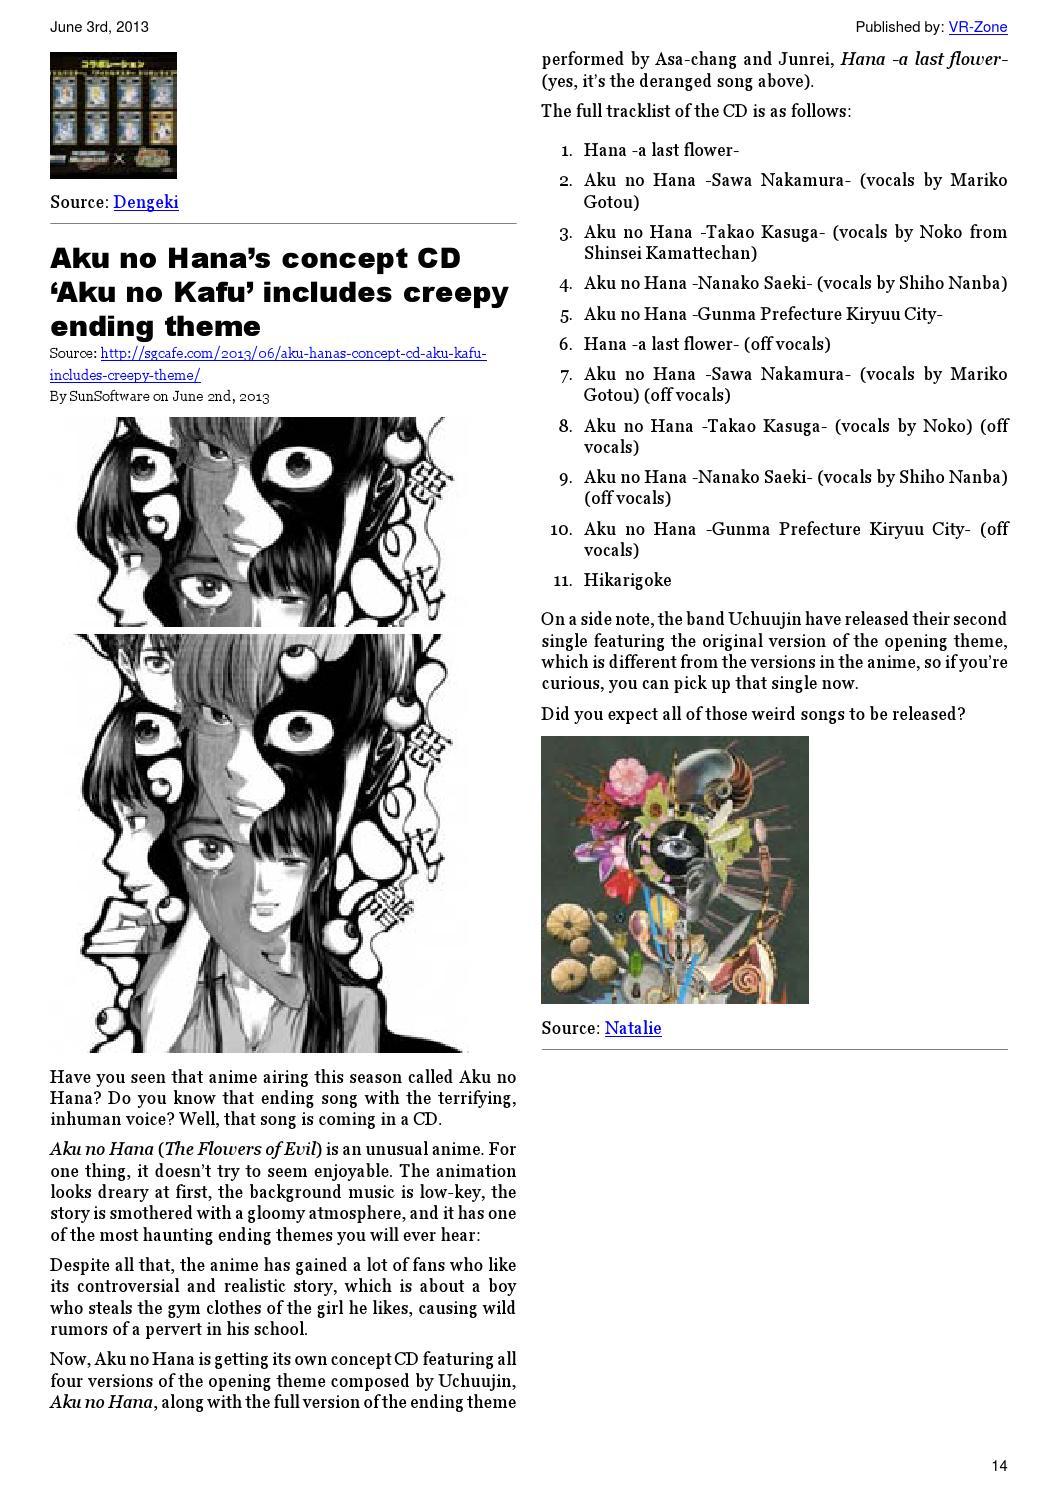 SGcafe Anime News For Otaku Jun 2013 Issue by VR Media Pte